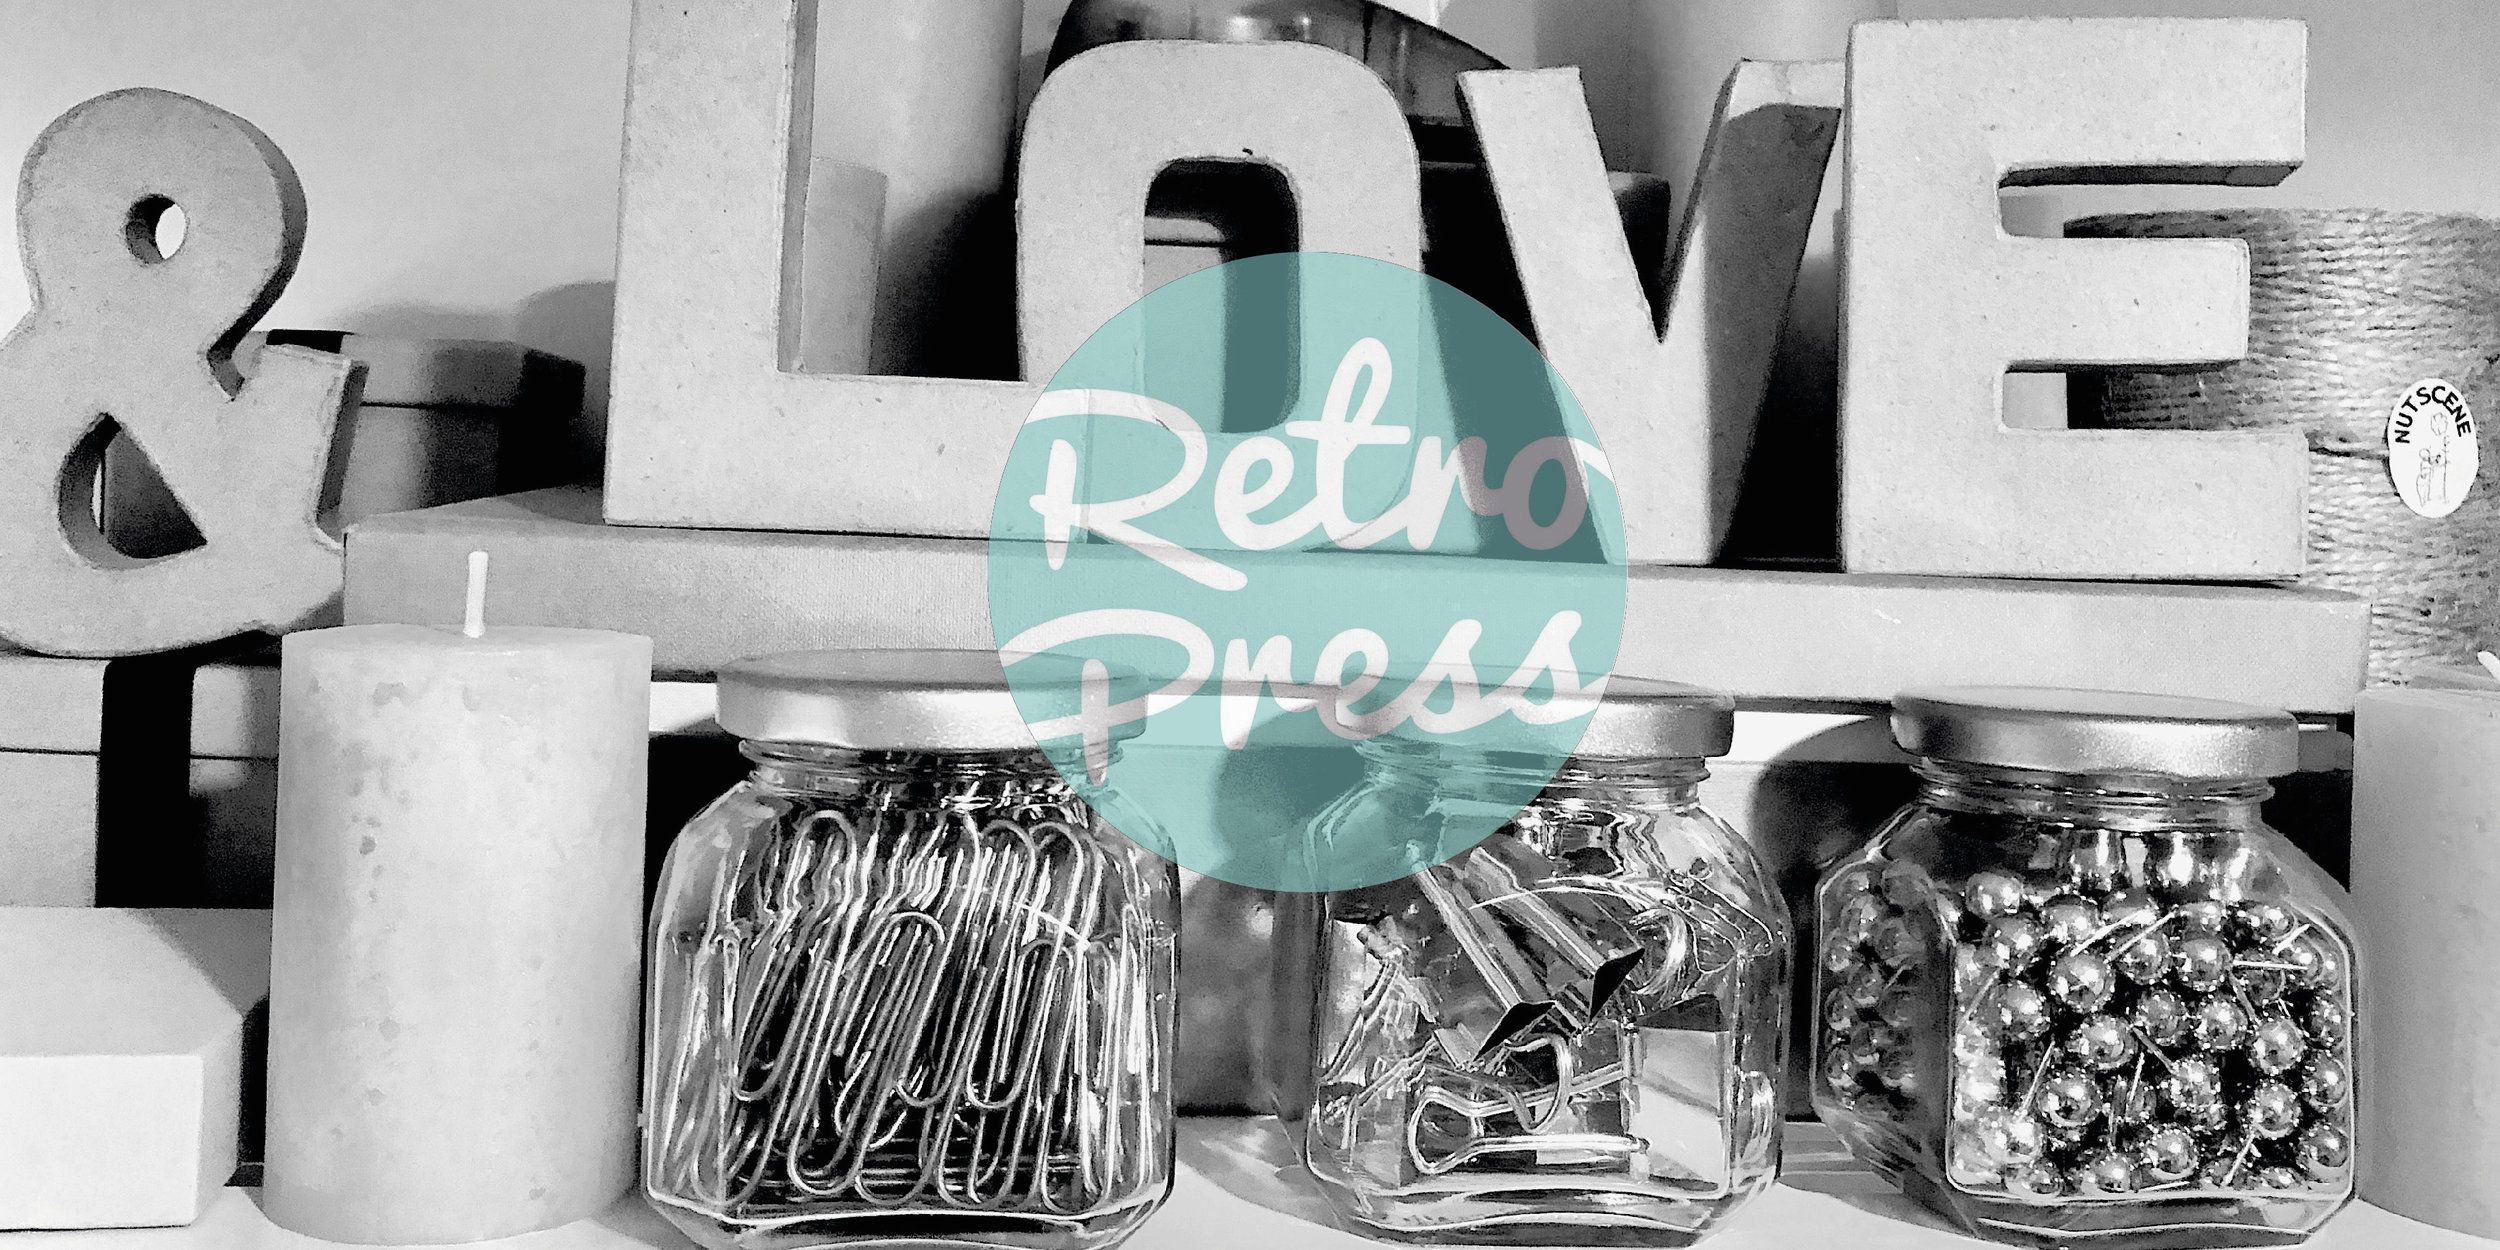 retro_press-01.jpg